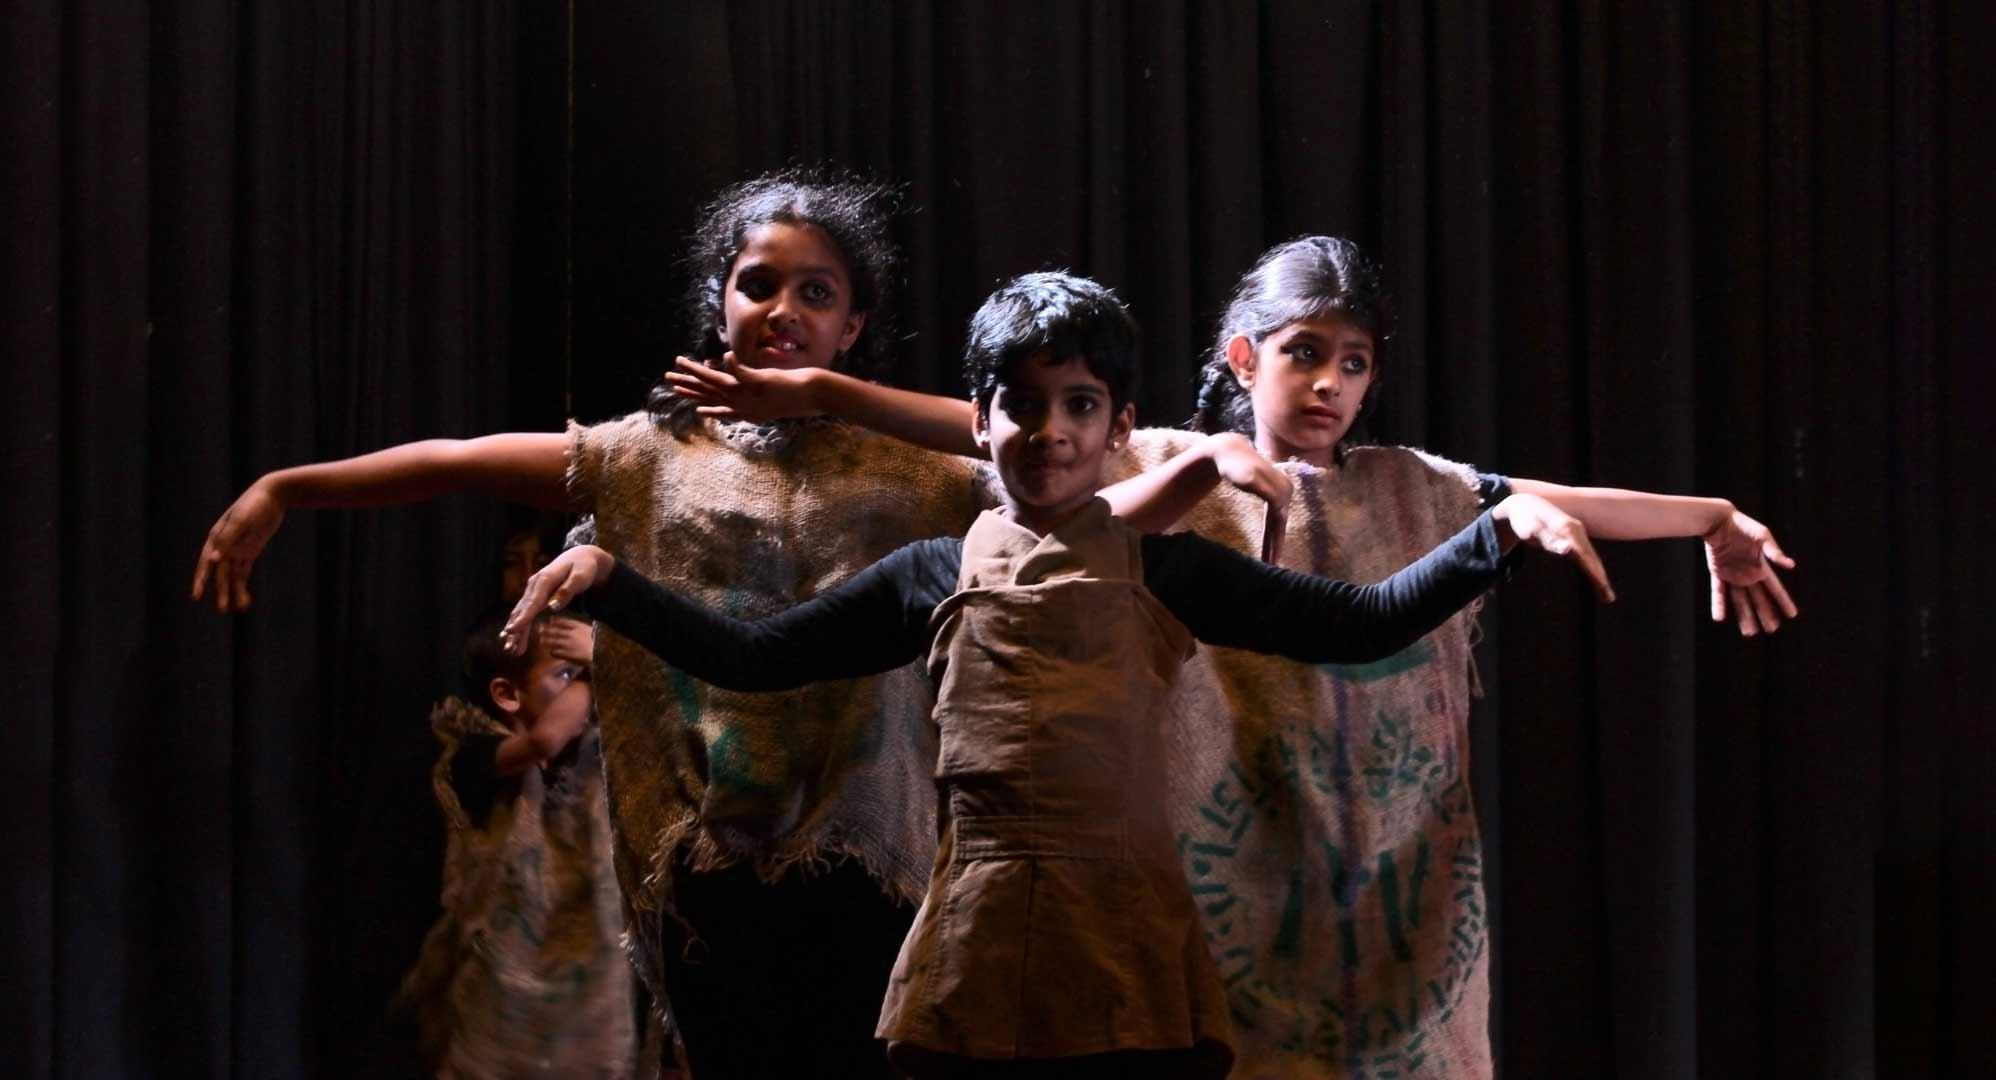 Bogase tumba aakaasha bhoomi, a devised play